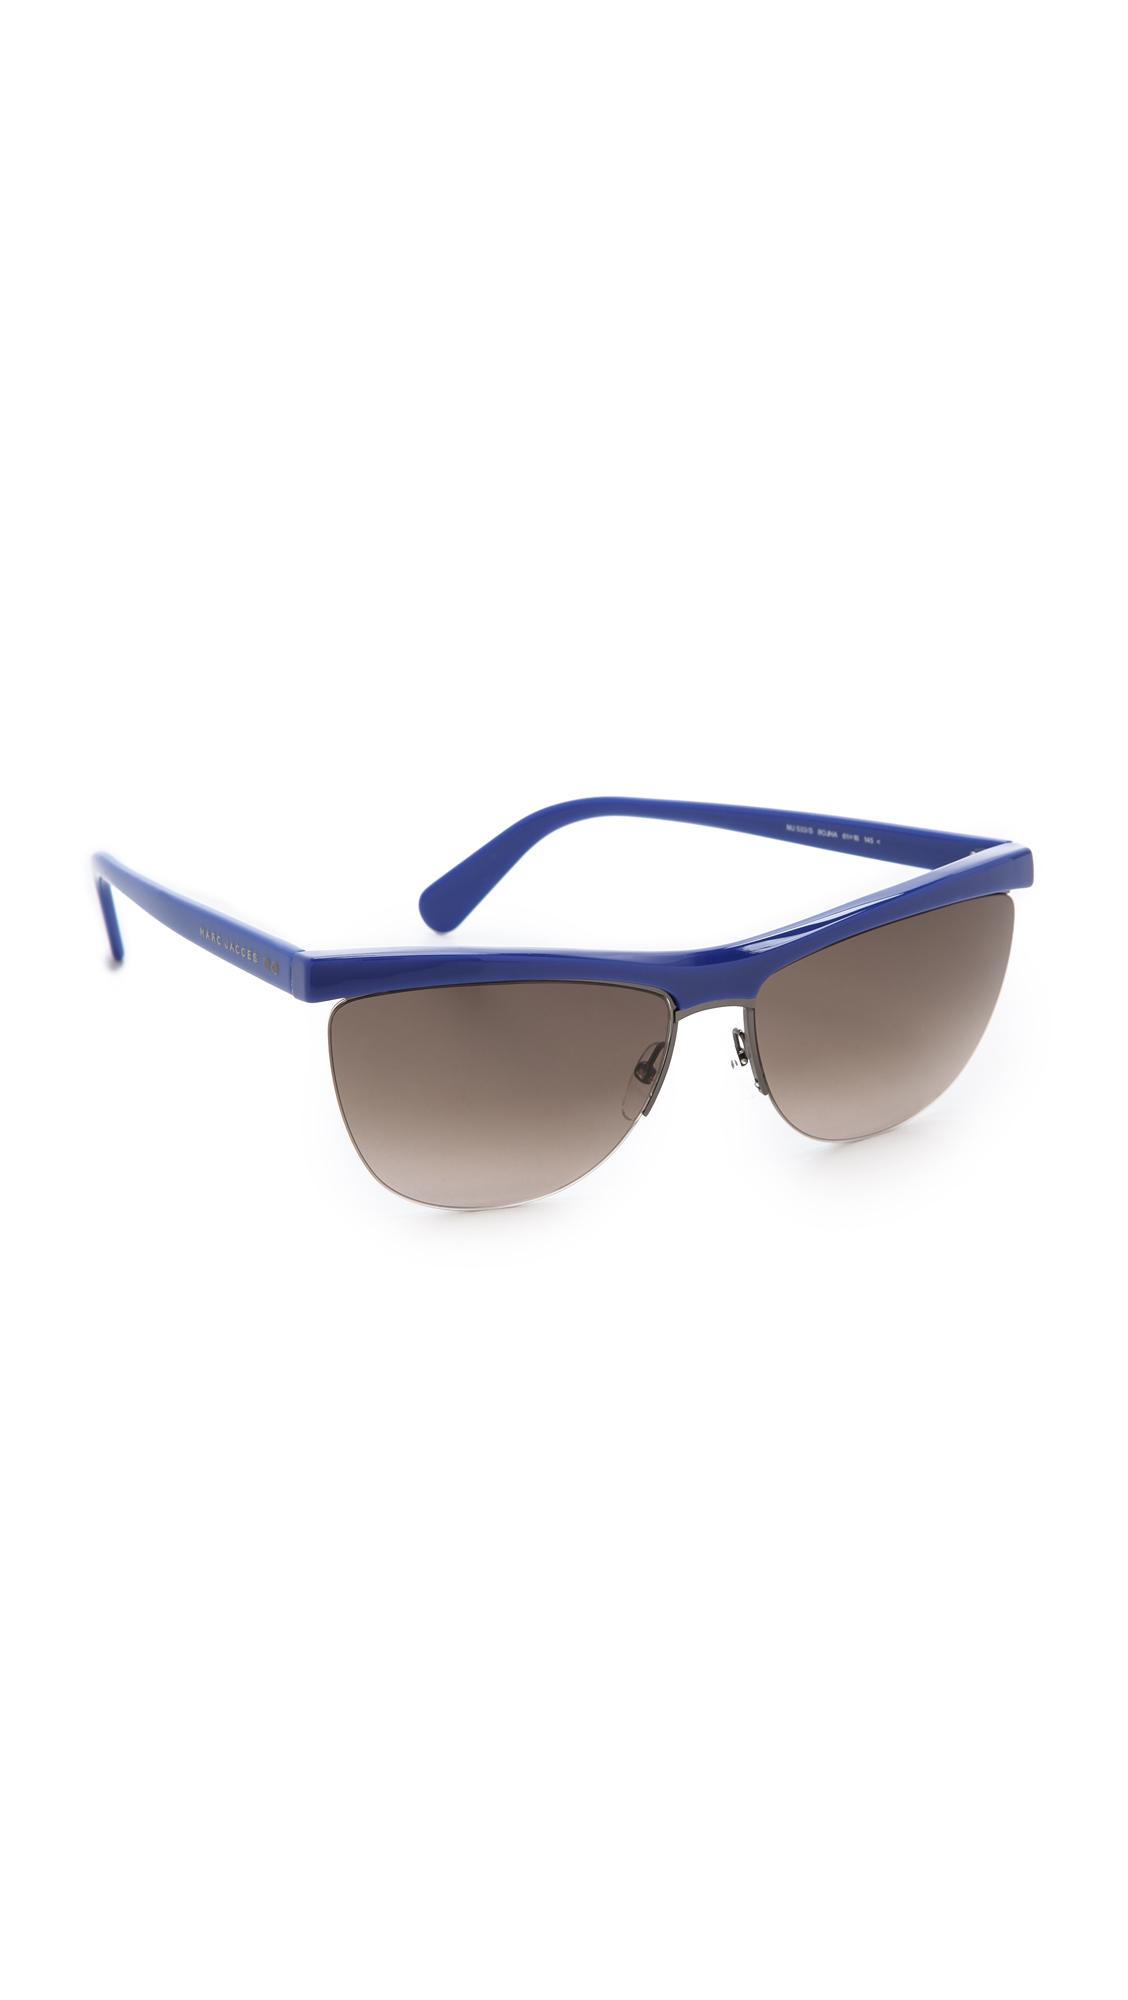 Bottom Rimless Glasses : Marc Jacobs Rimless Bottom Sunglasses - Gold/Brown ...